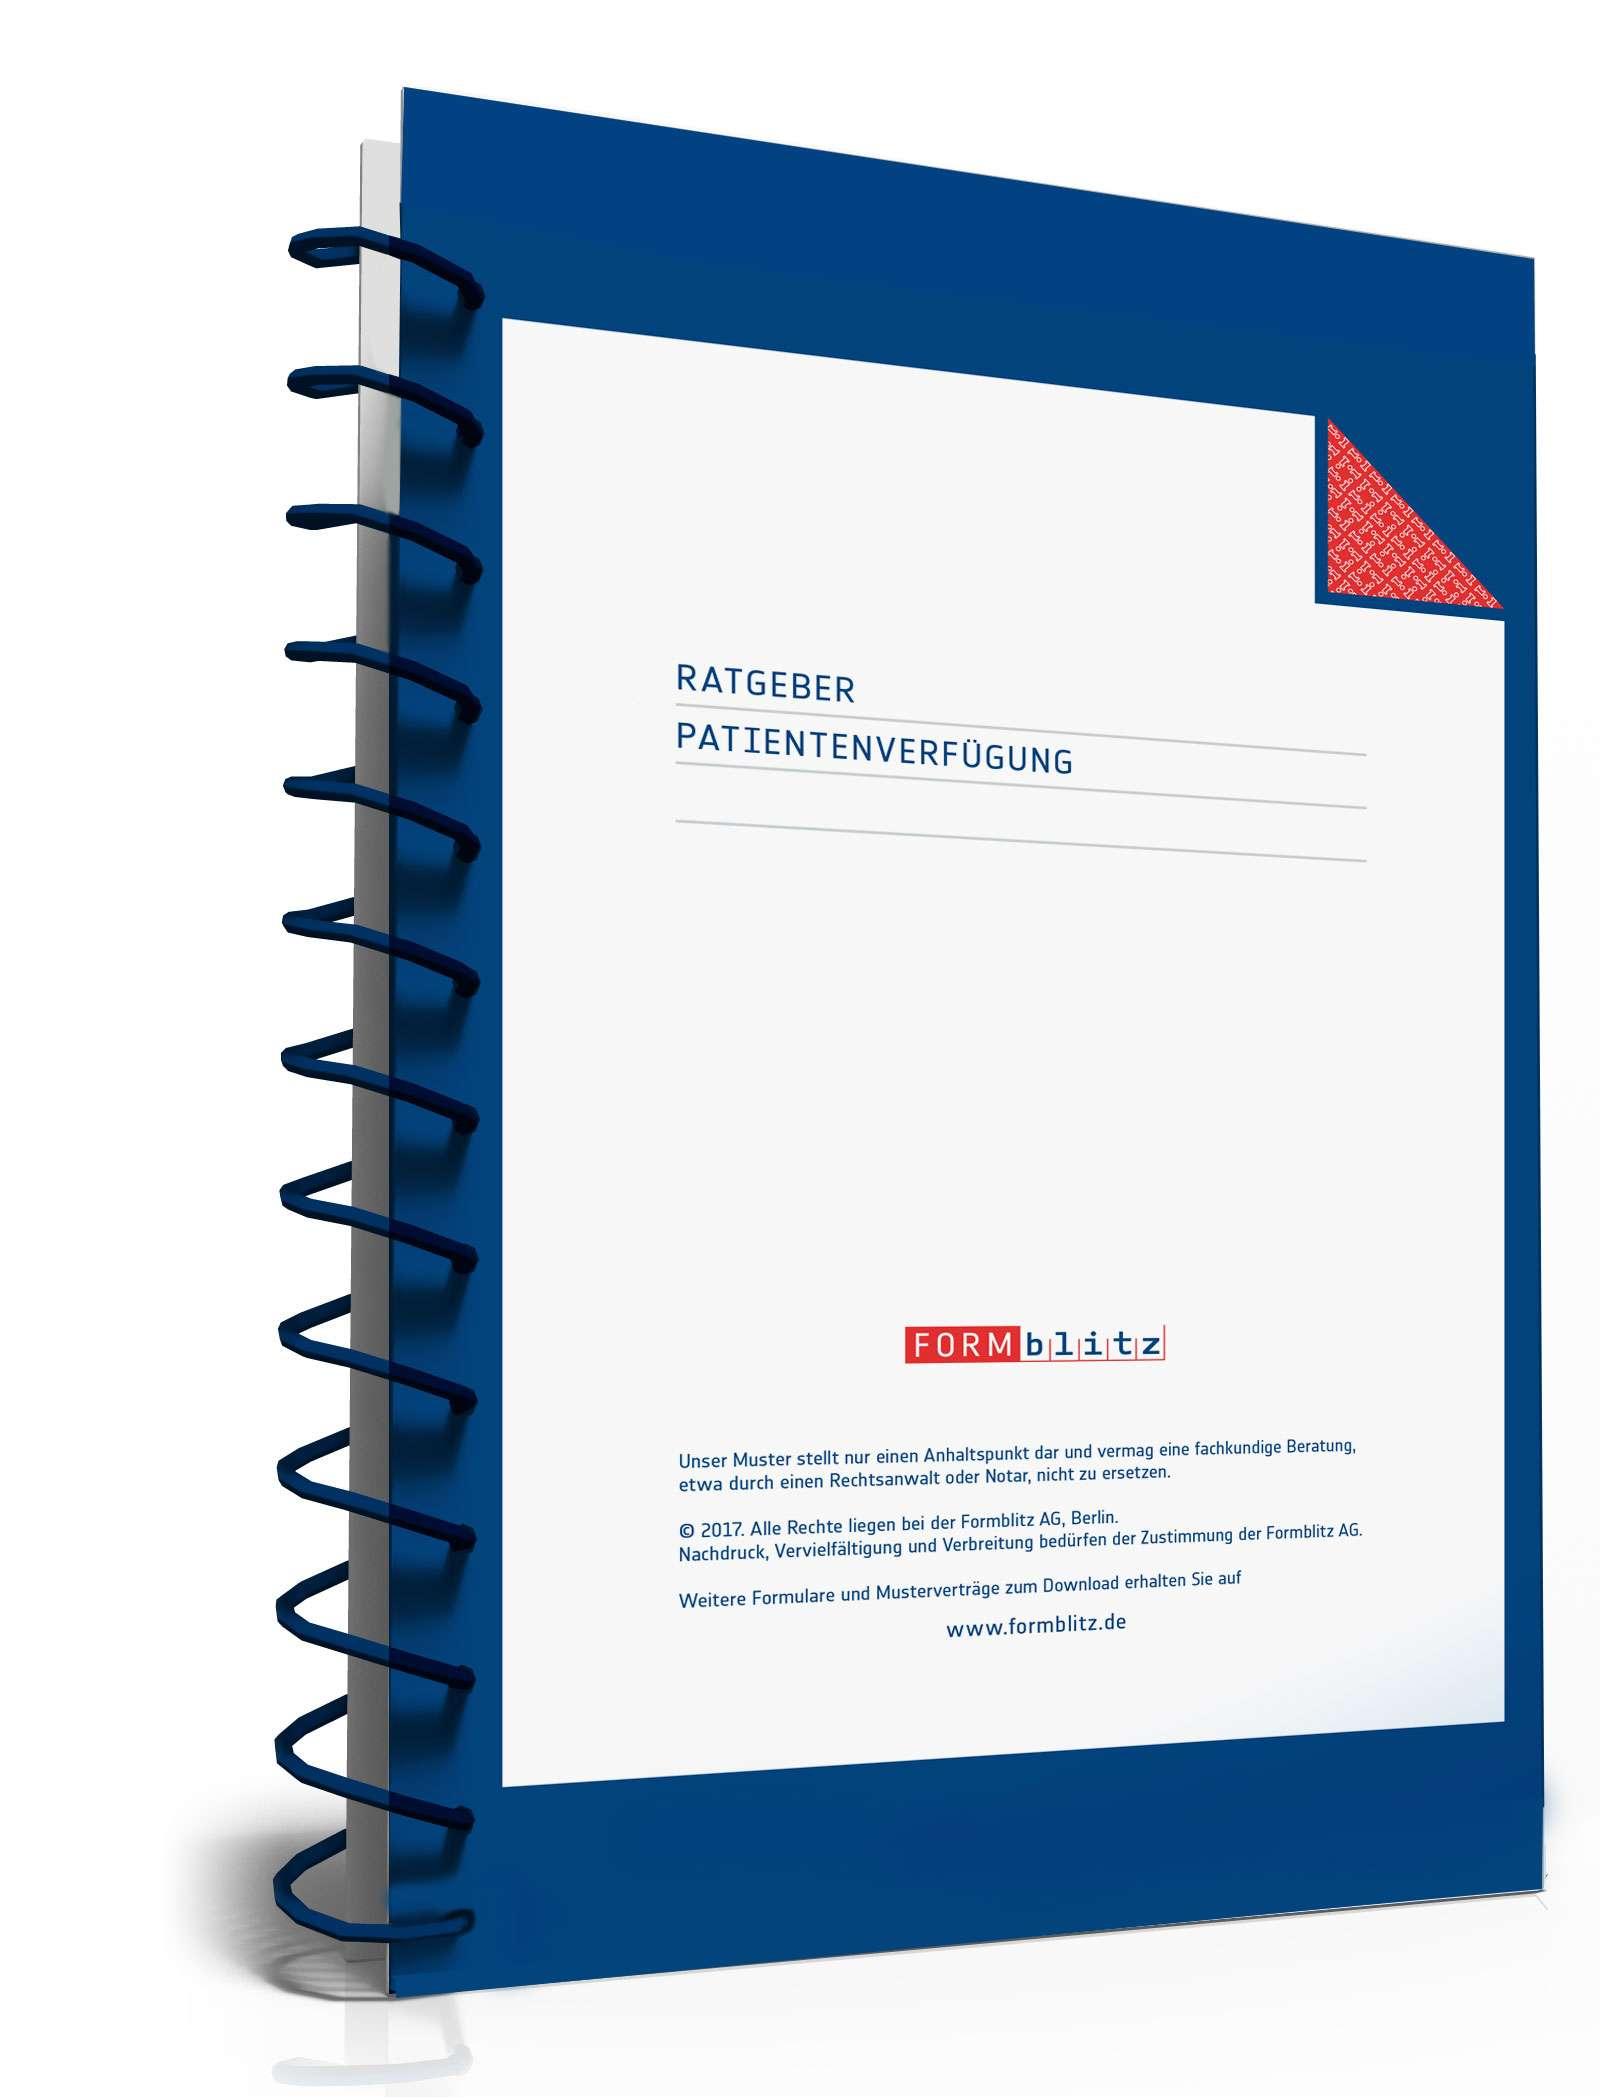 ratgeber patientenverf gung zum download als pdf. Black Bedroom Furniture Sets. Home Design Ideas